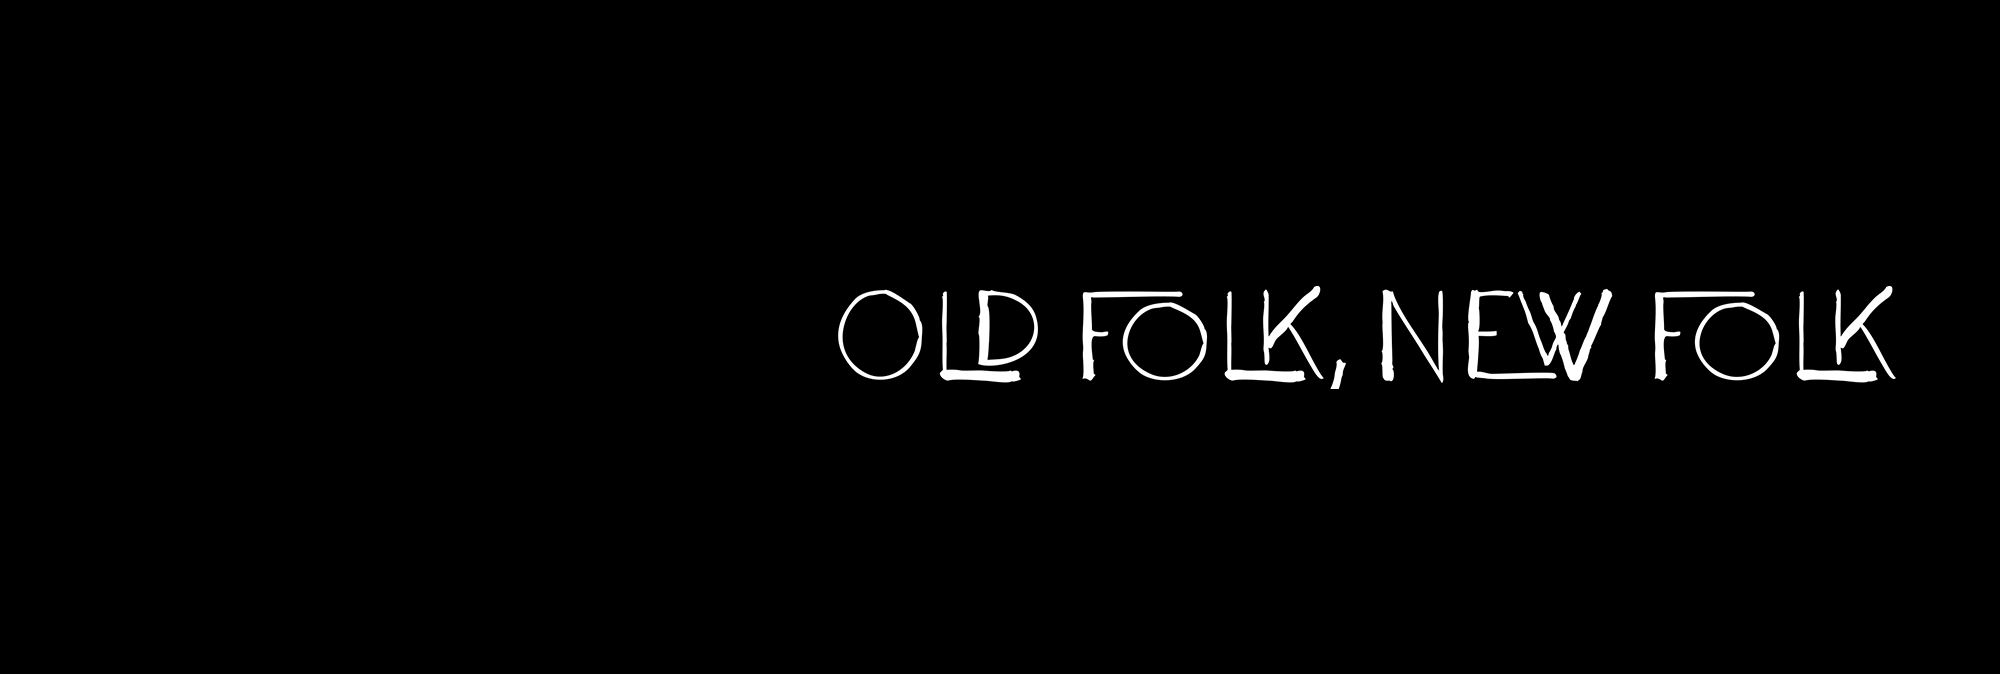 cmhof-banner-olf-folk-new-folk